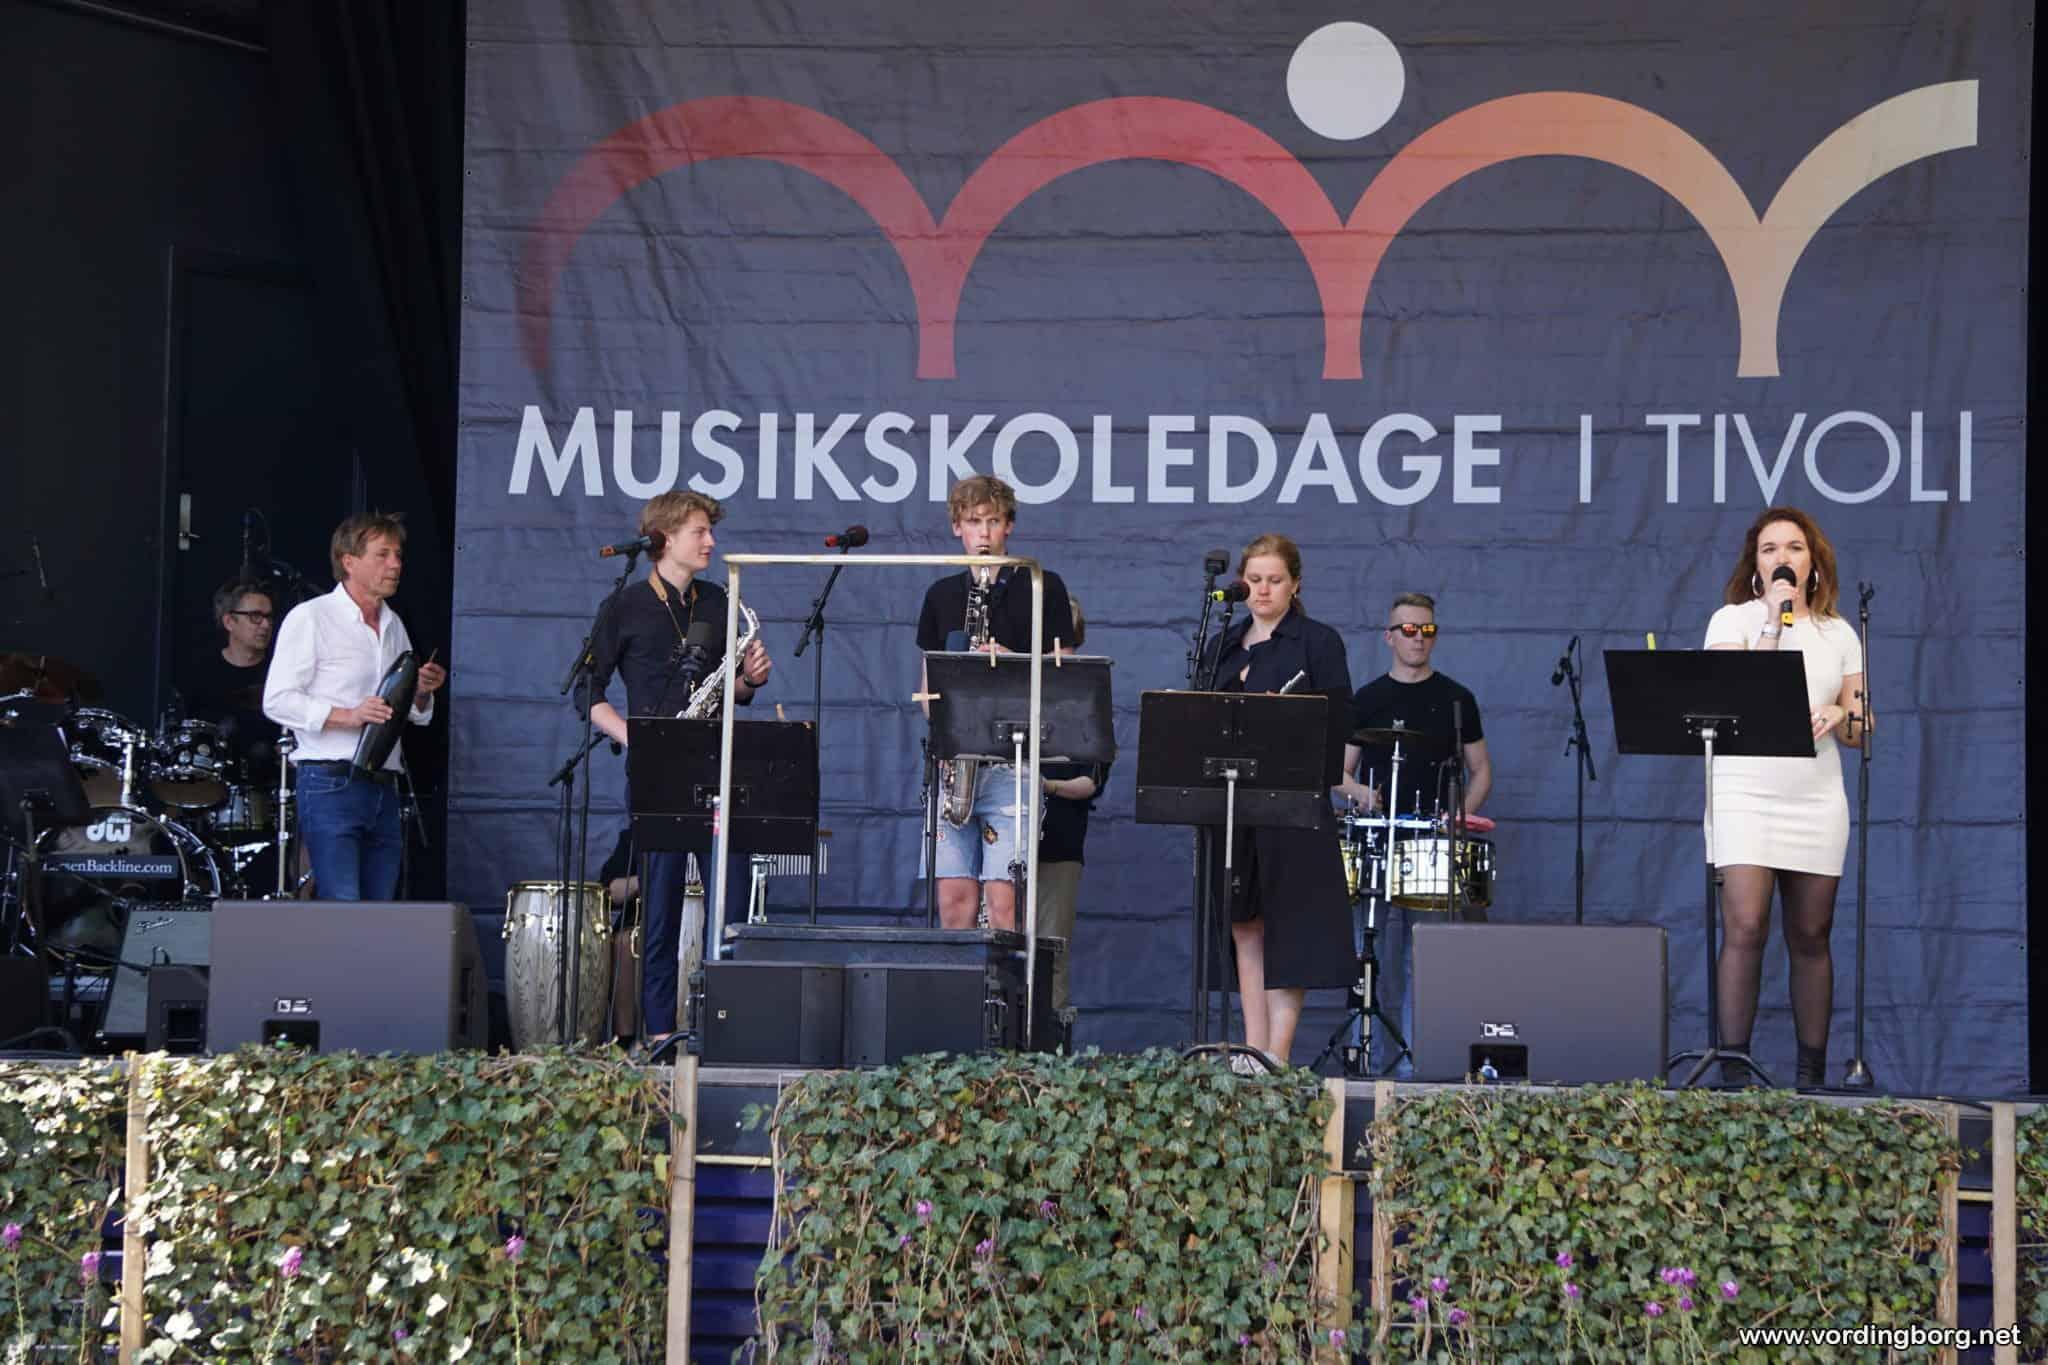 Vordingborg Musikskole deltog i Musikskoledage i Tivoli i København